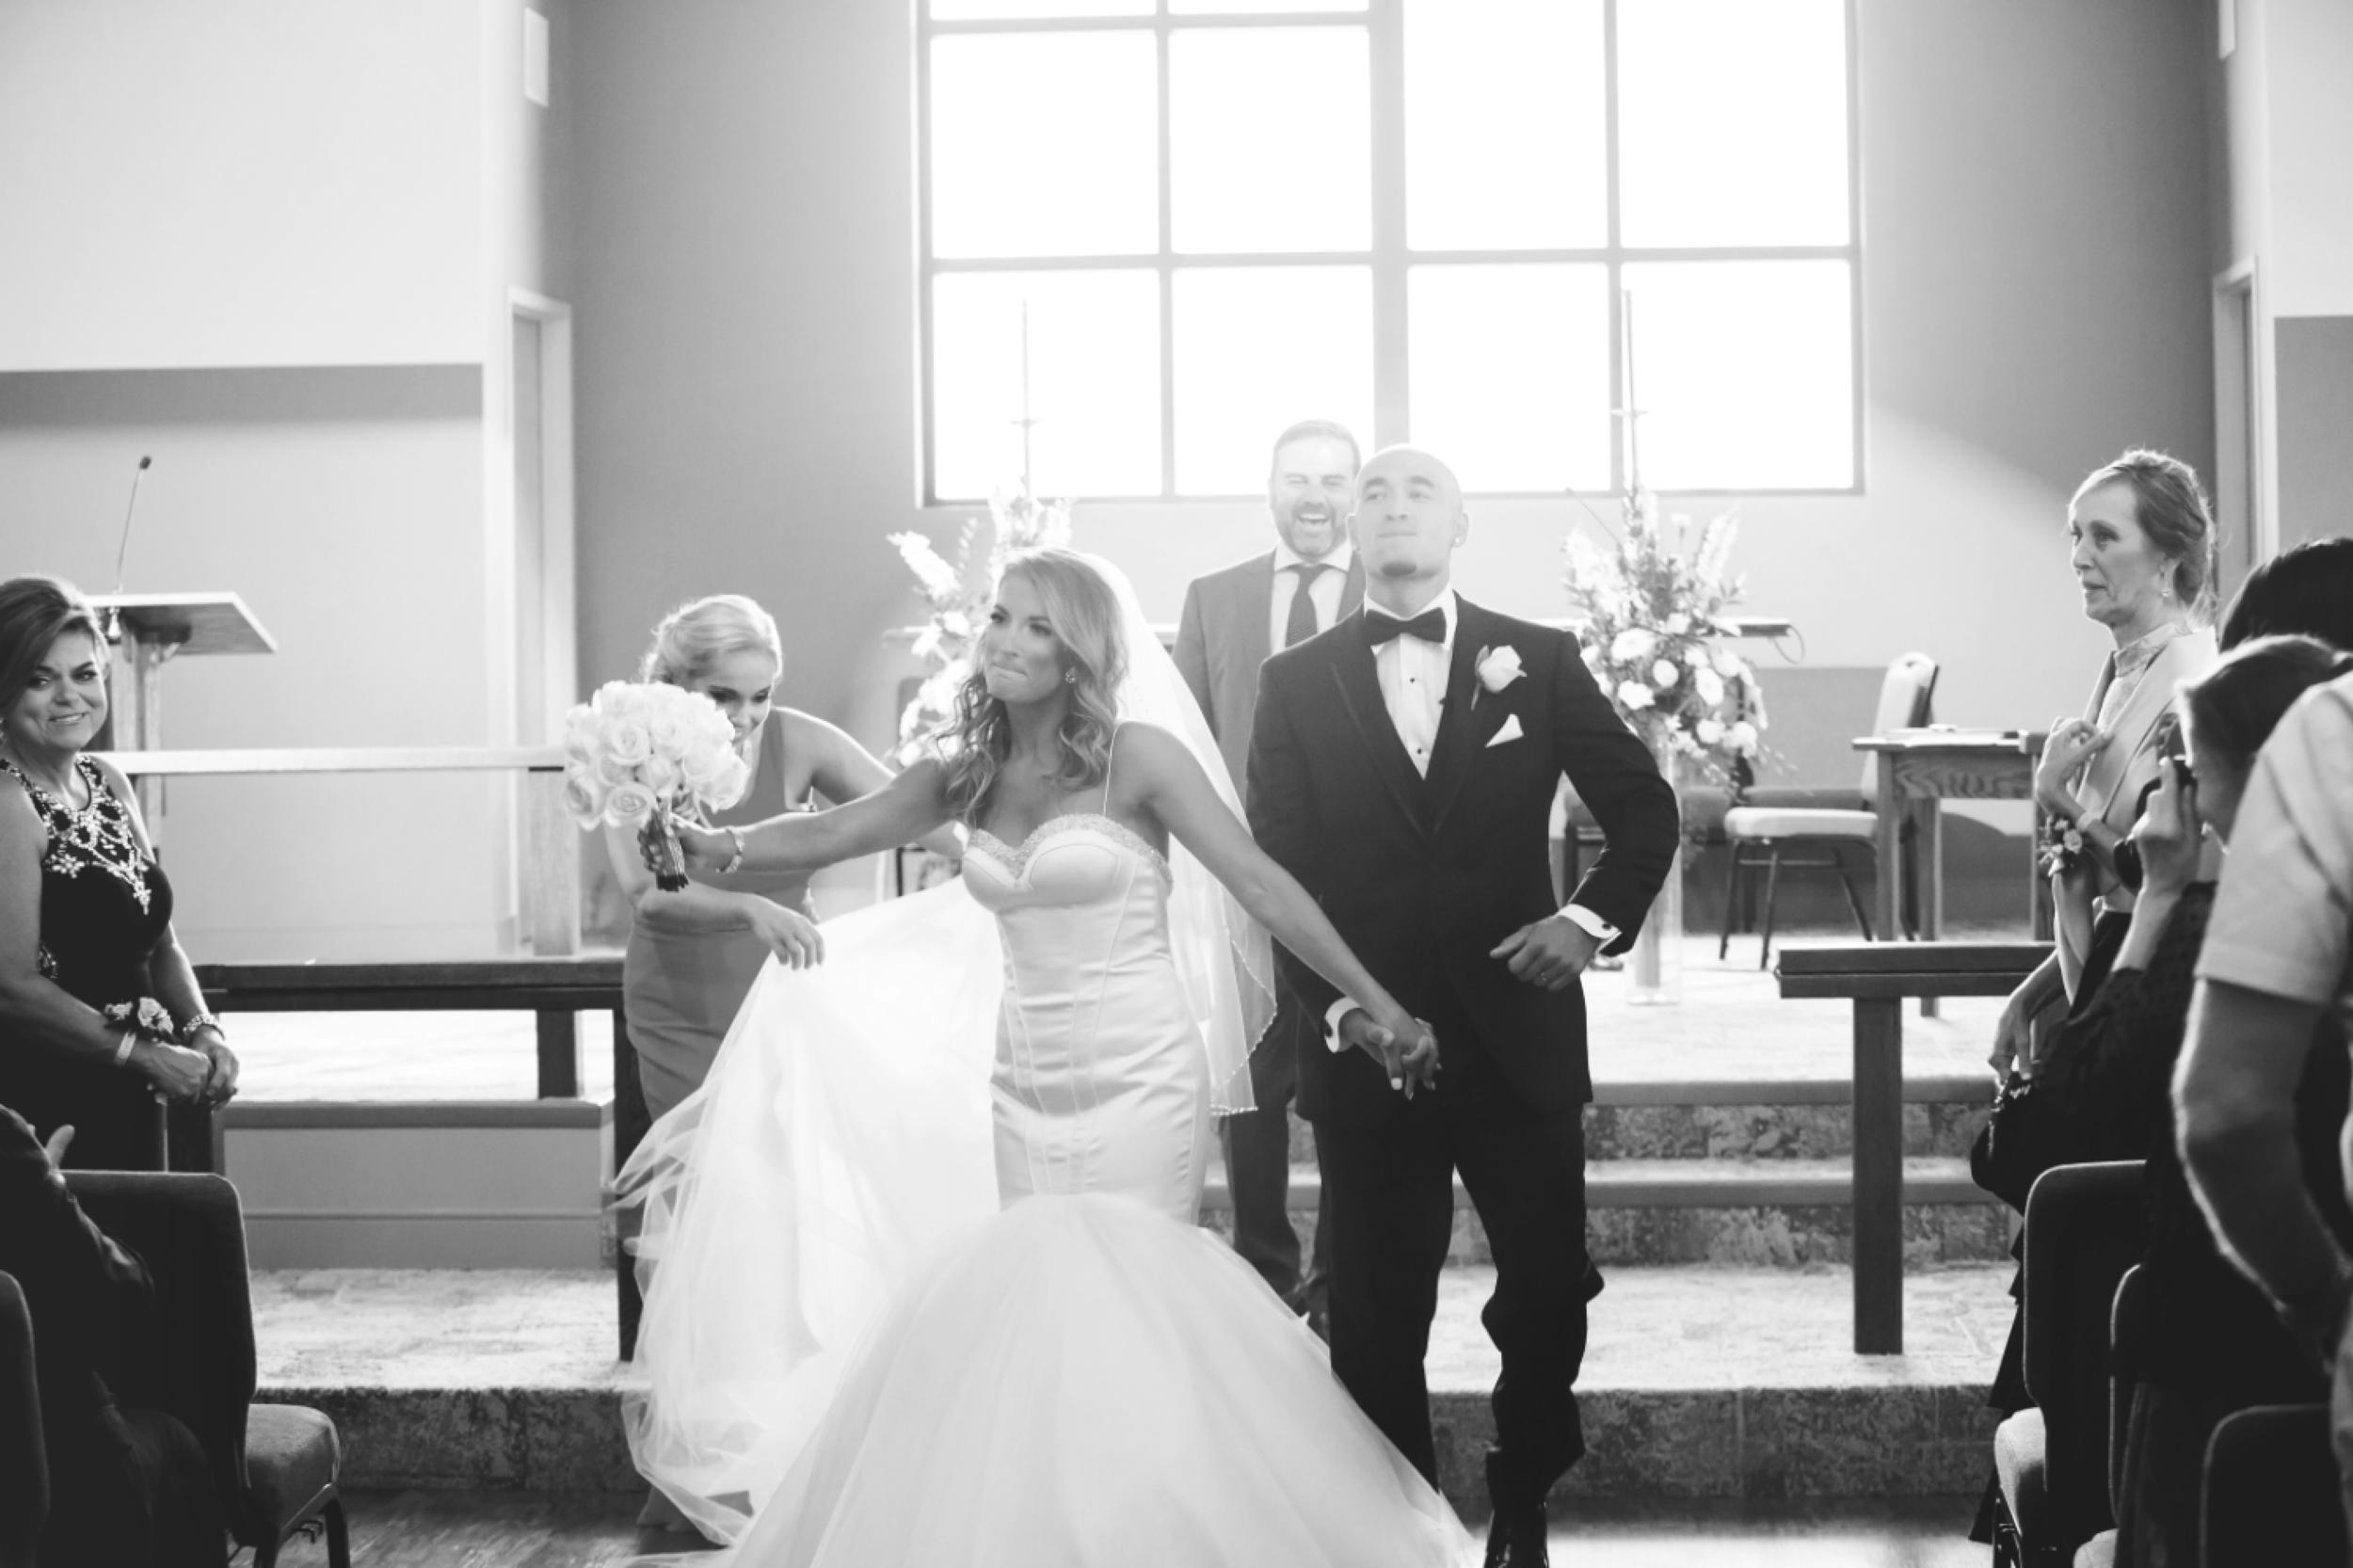 Wedding-Burlington-Convention-Center-Burlington-Oakville-Toronto-Hamilton-Niagara-Wedding-Photographer-Photography-Moments-by-Lauren-Photo-Image-25.png